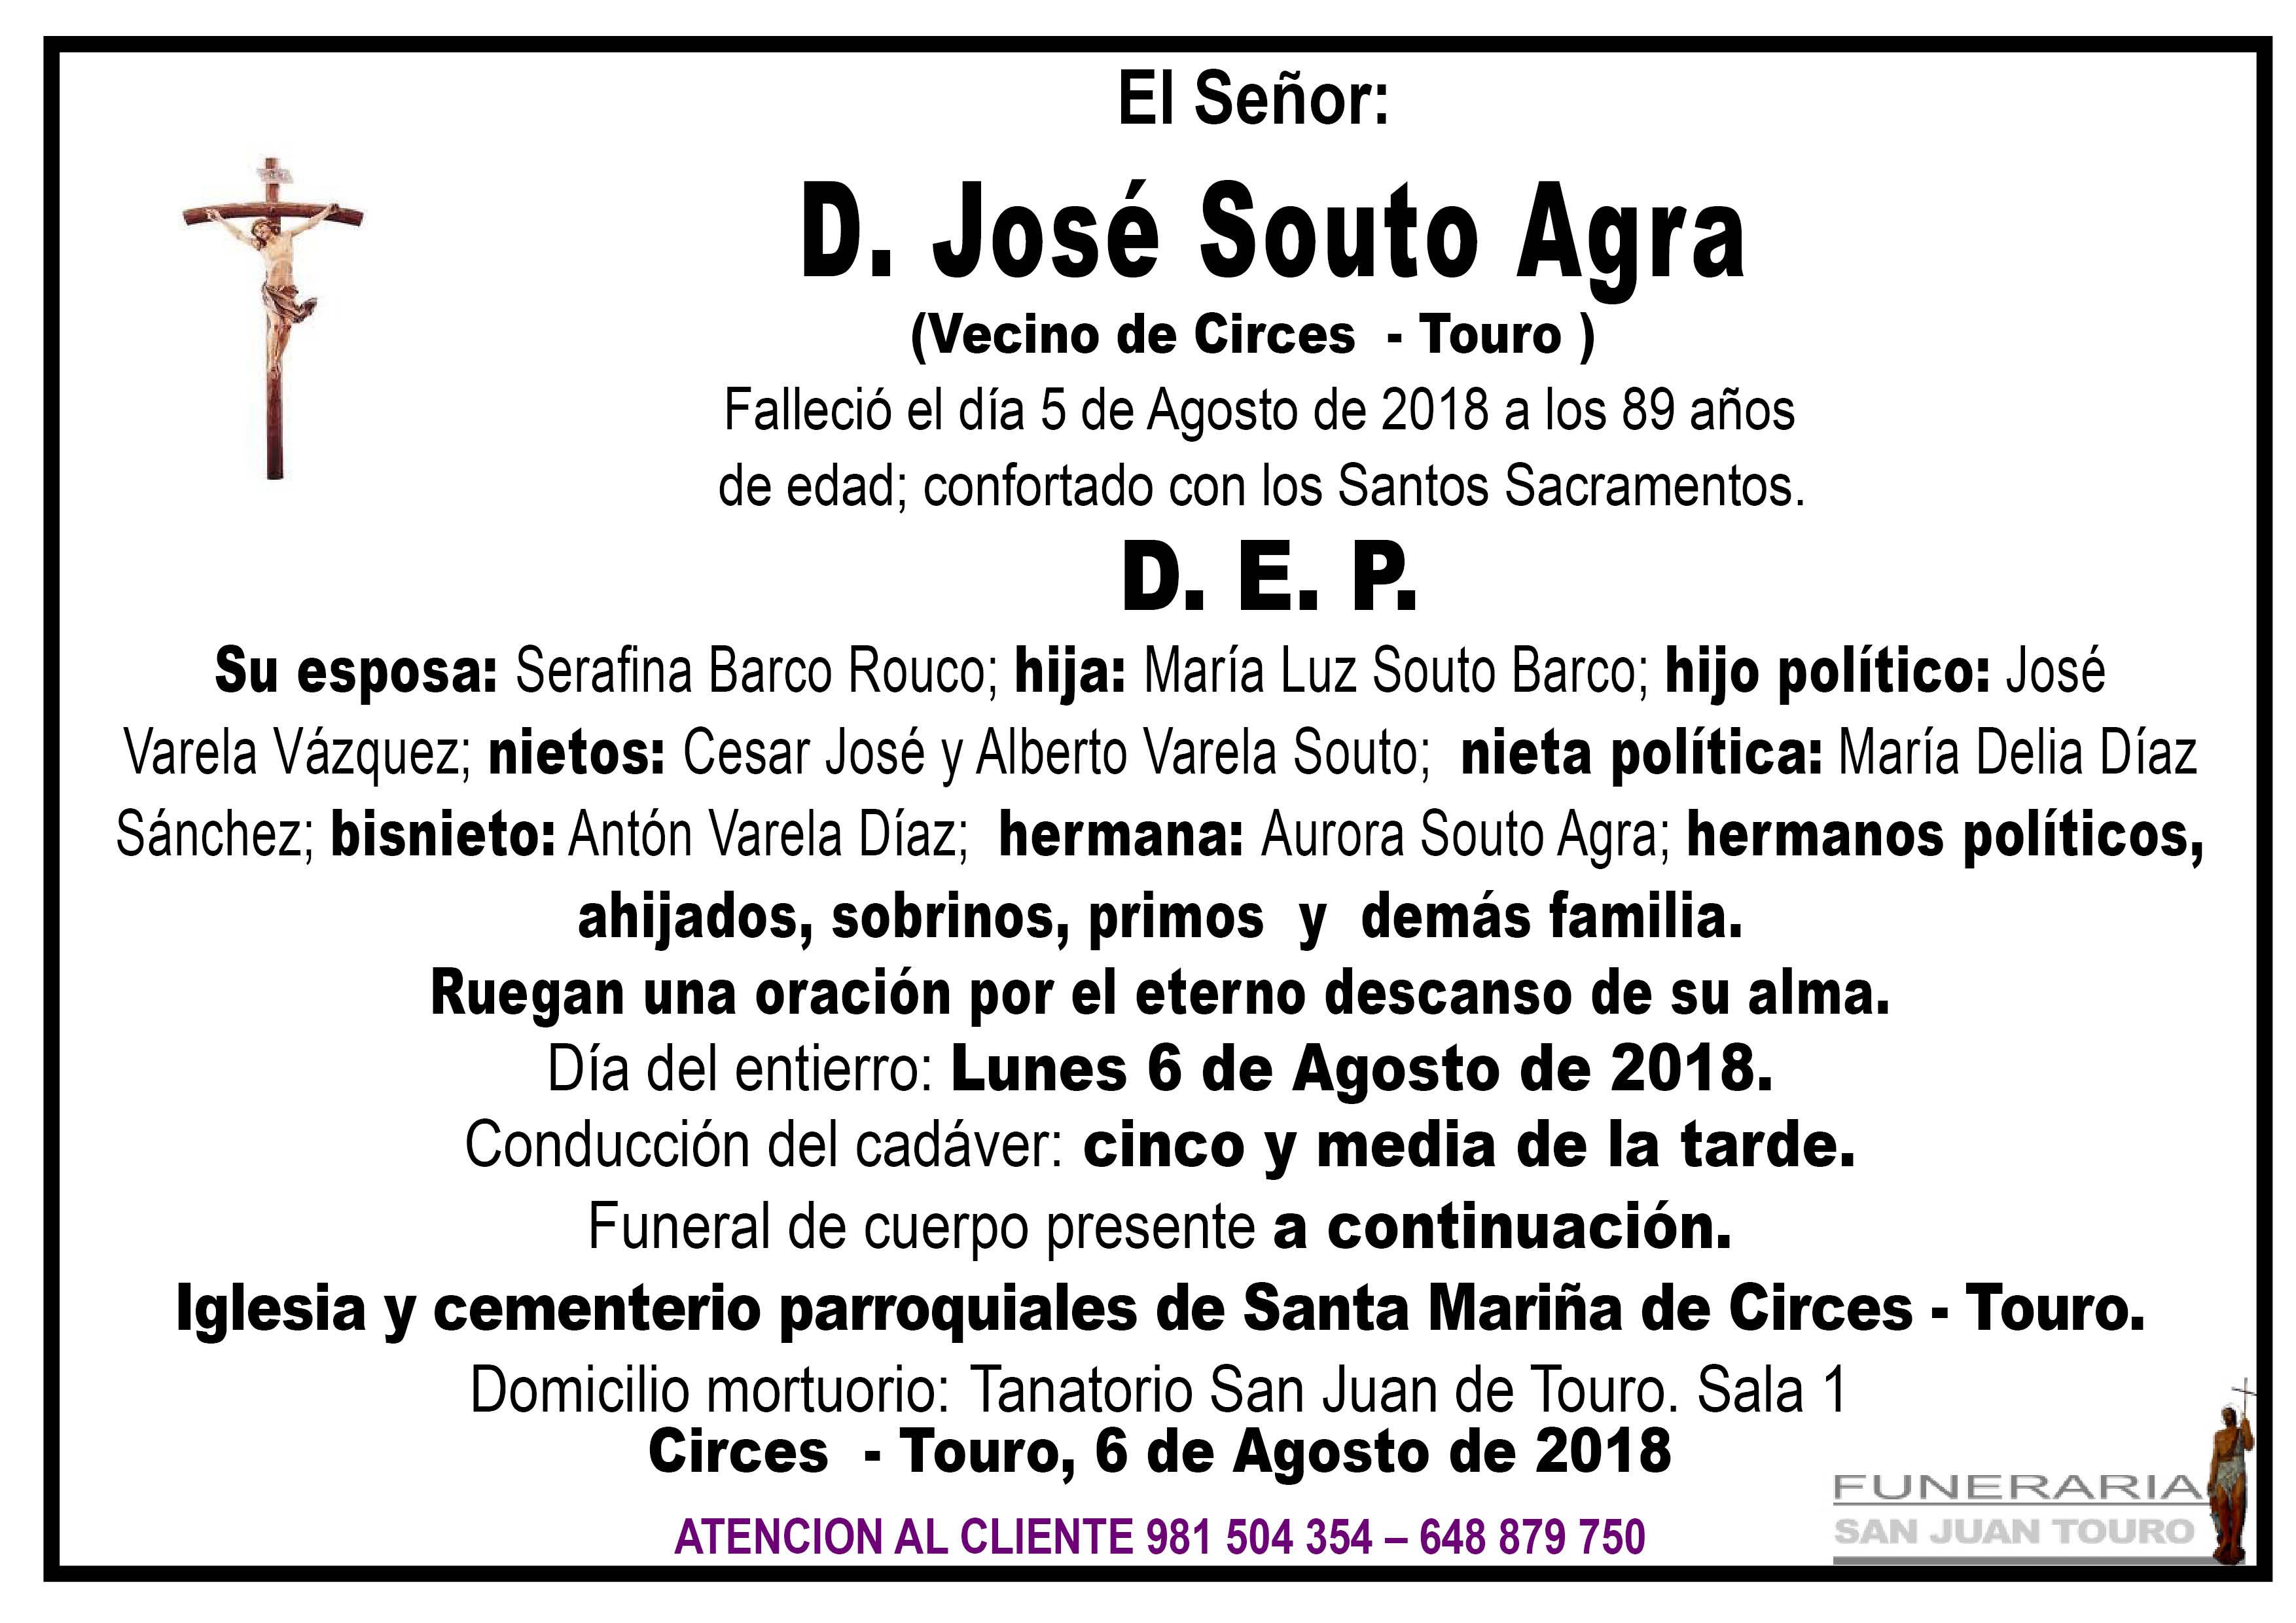 Esquela de SEPELIO DE DON JOSÉ SOUTO AGRA